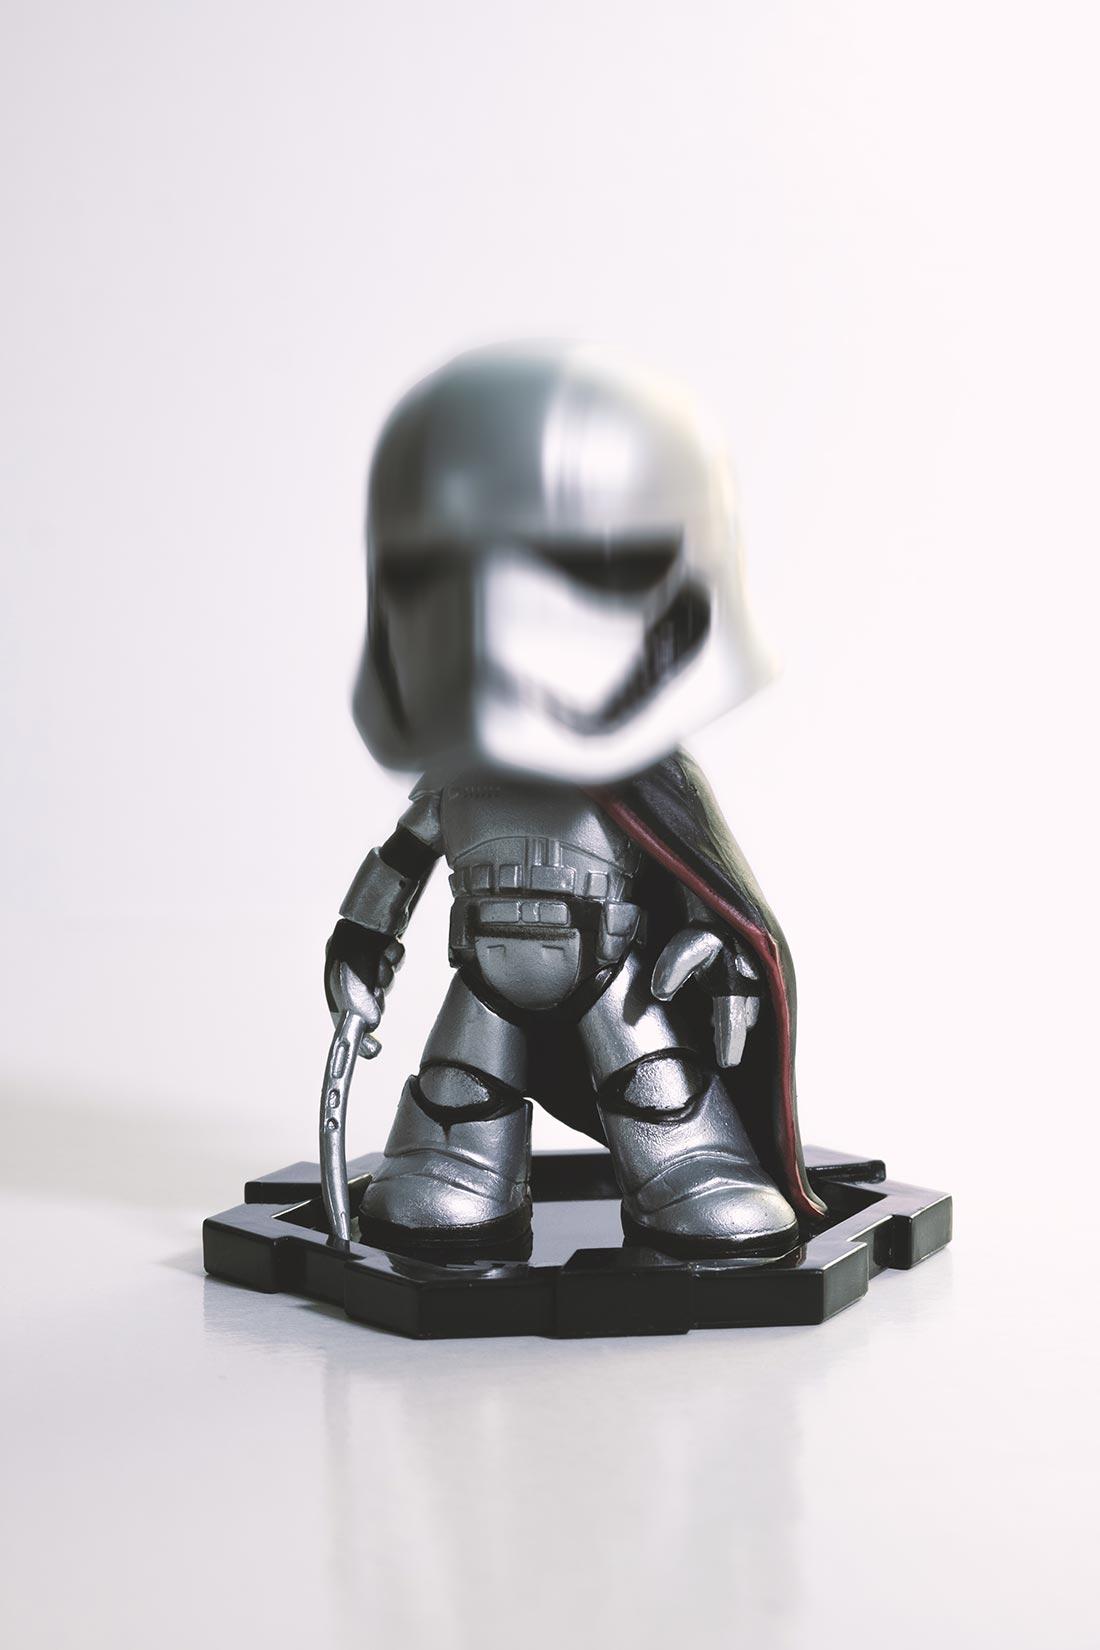 Captain Phasma / 1:6 - Funko Mystery Minis Star Wars